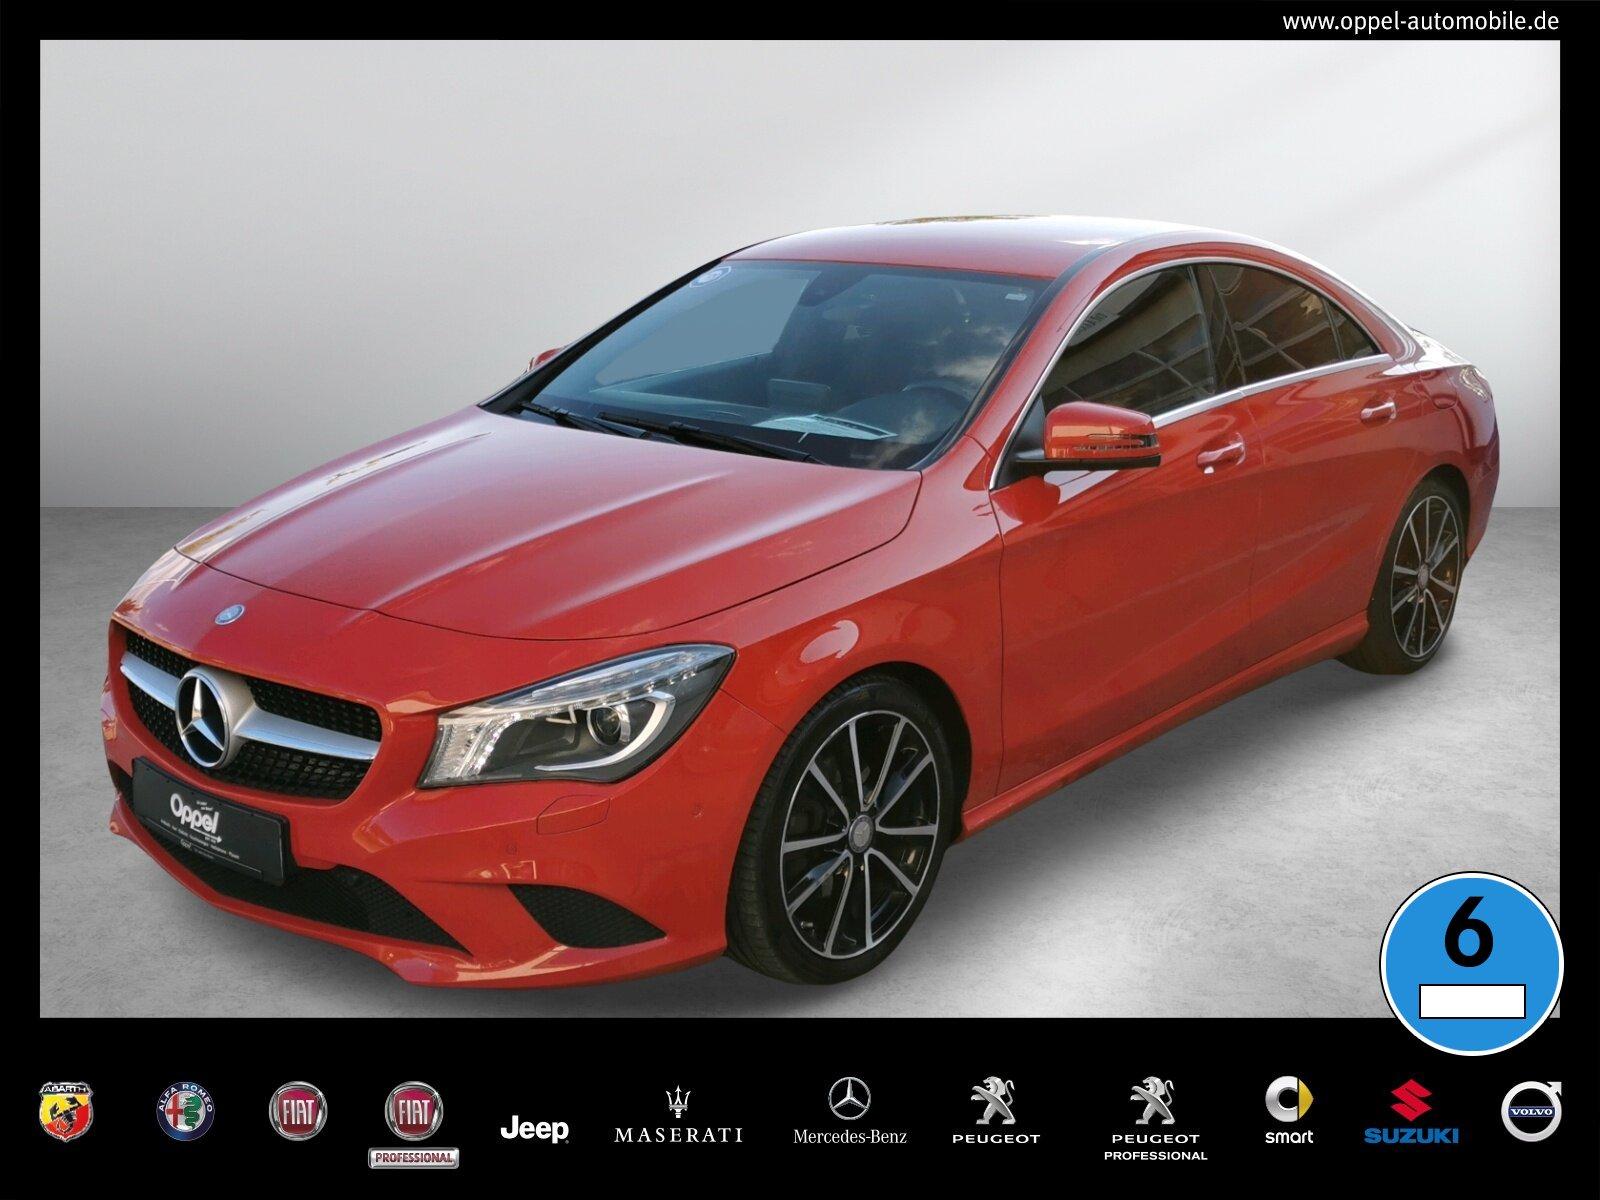 Mercedes-Benz CLA 200 Coupé ++URBAN+KAMERA+TEMPOMAT+BI-XENON++, Jahr 2016, Benzin